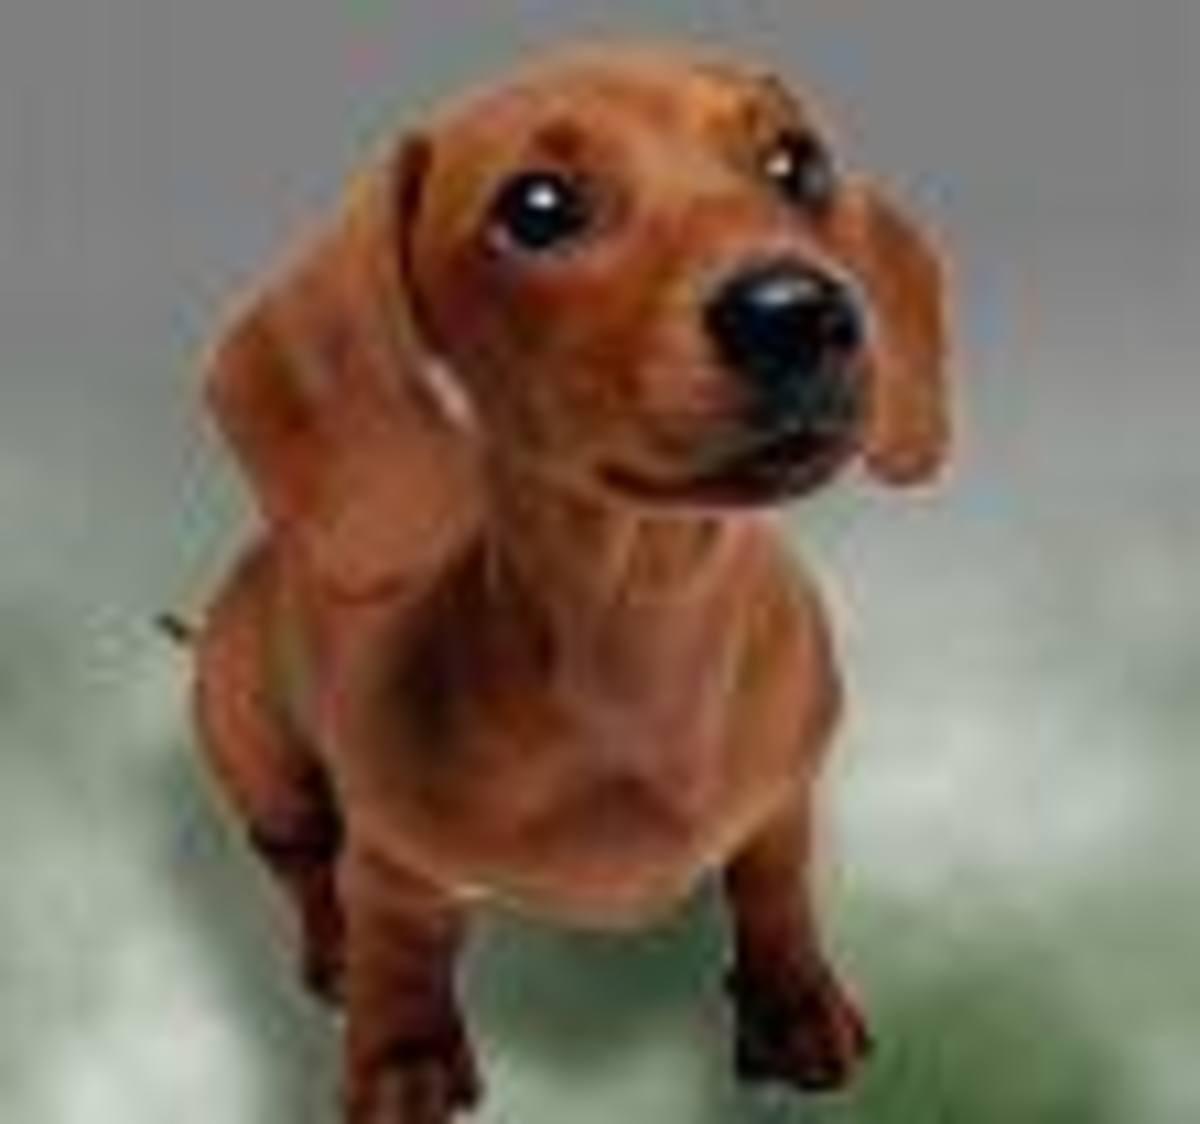 swedish-bitters-helped-my-dachshund-breathe